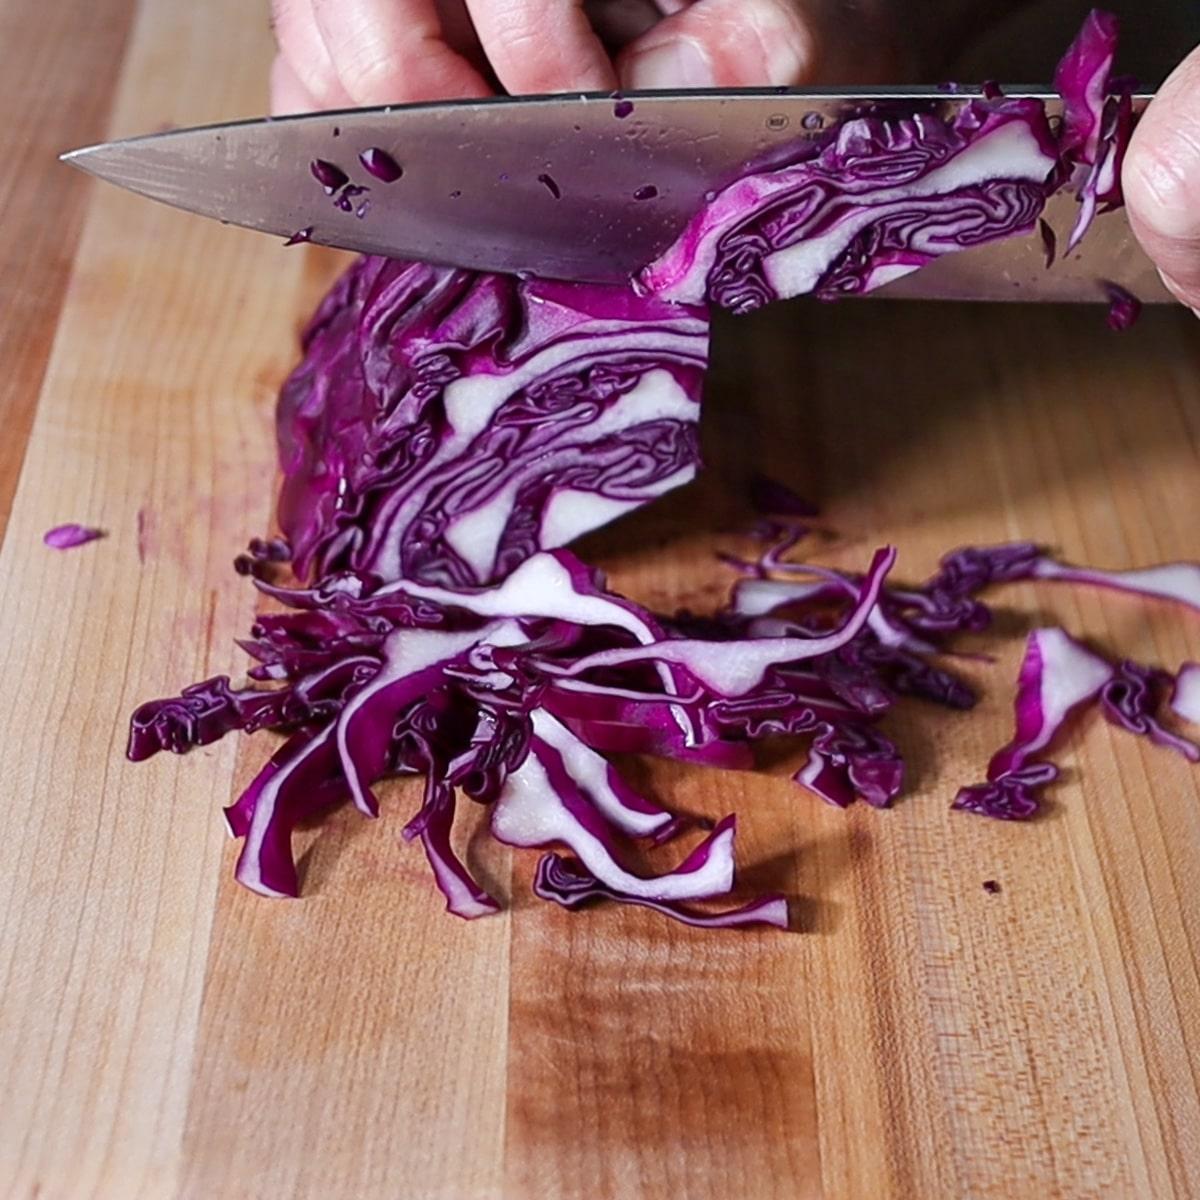 shredding with a knife